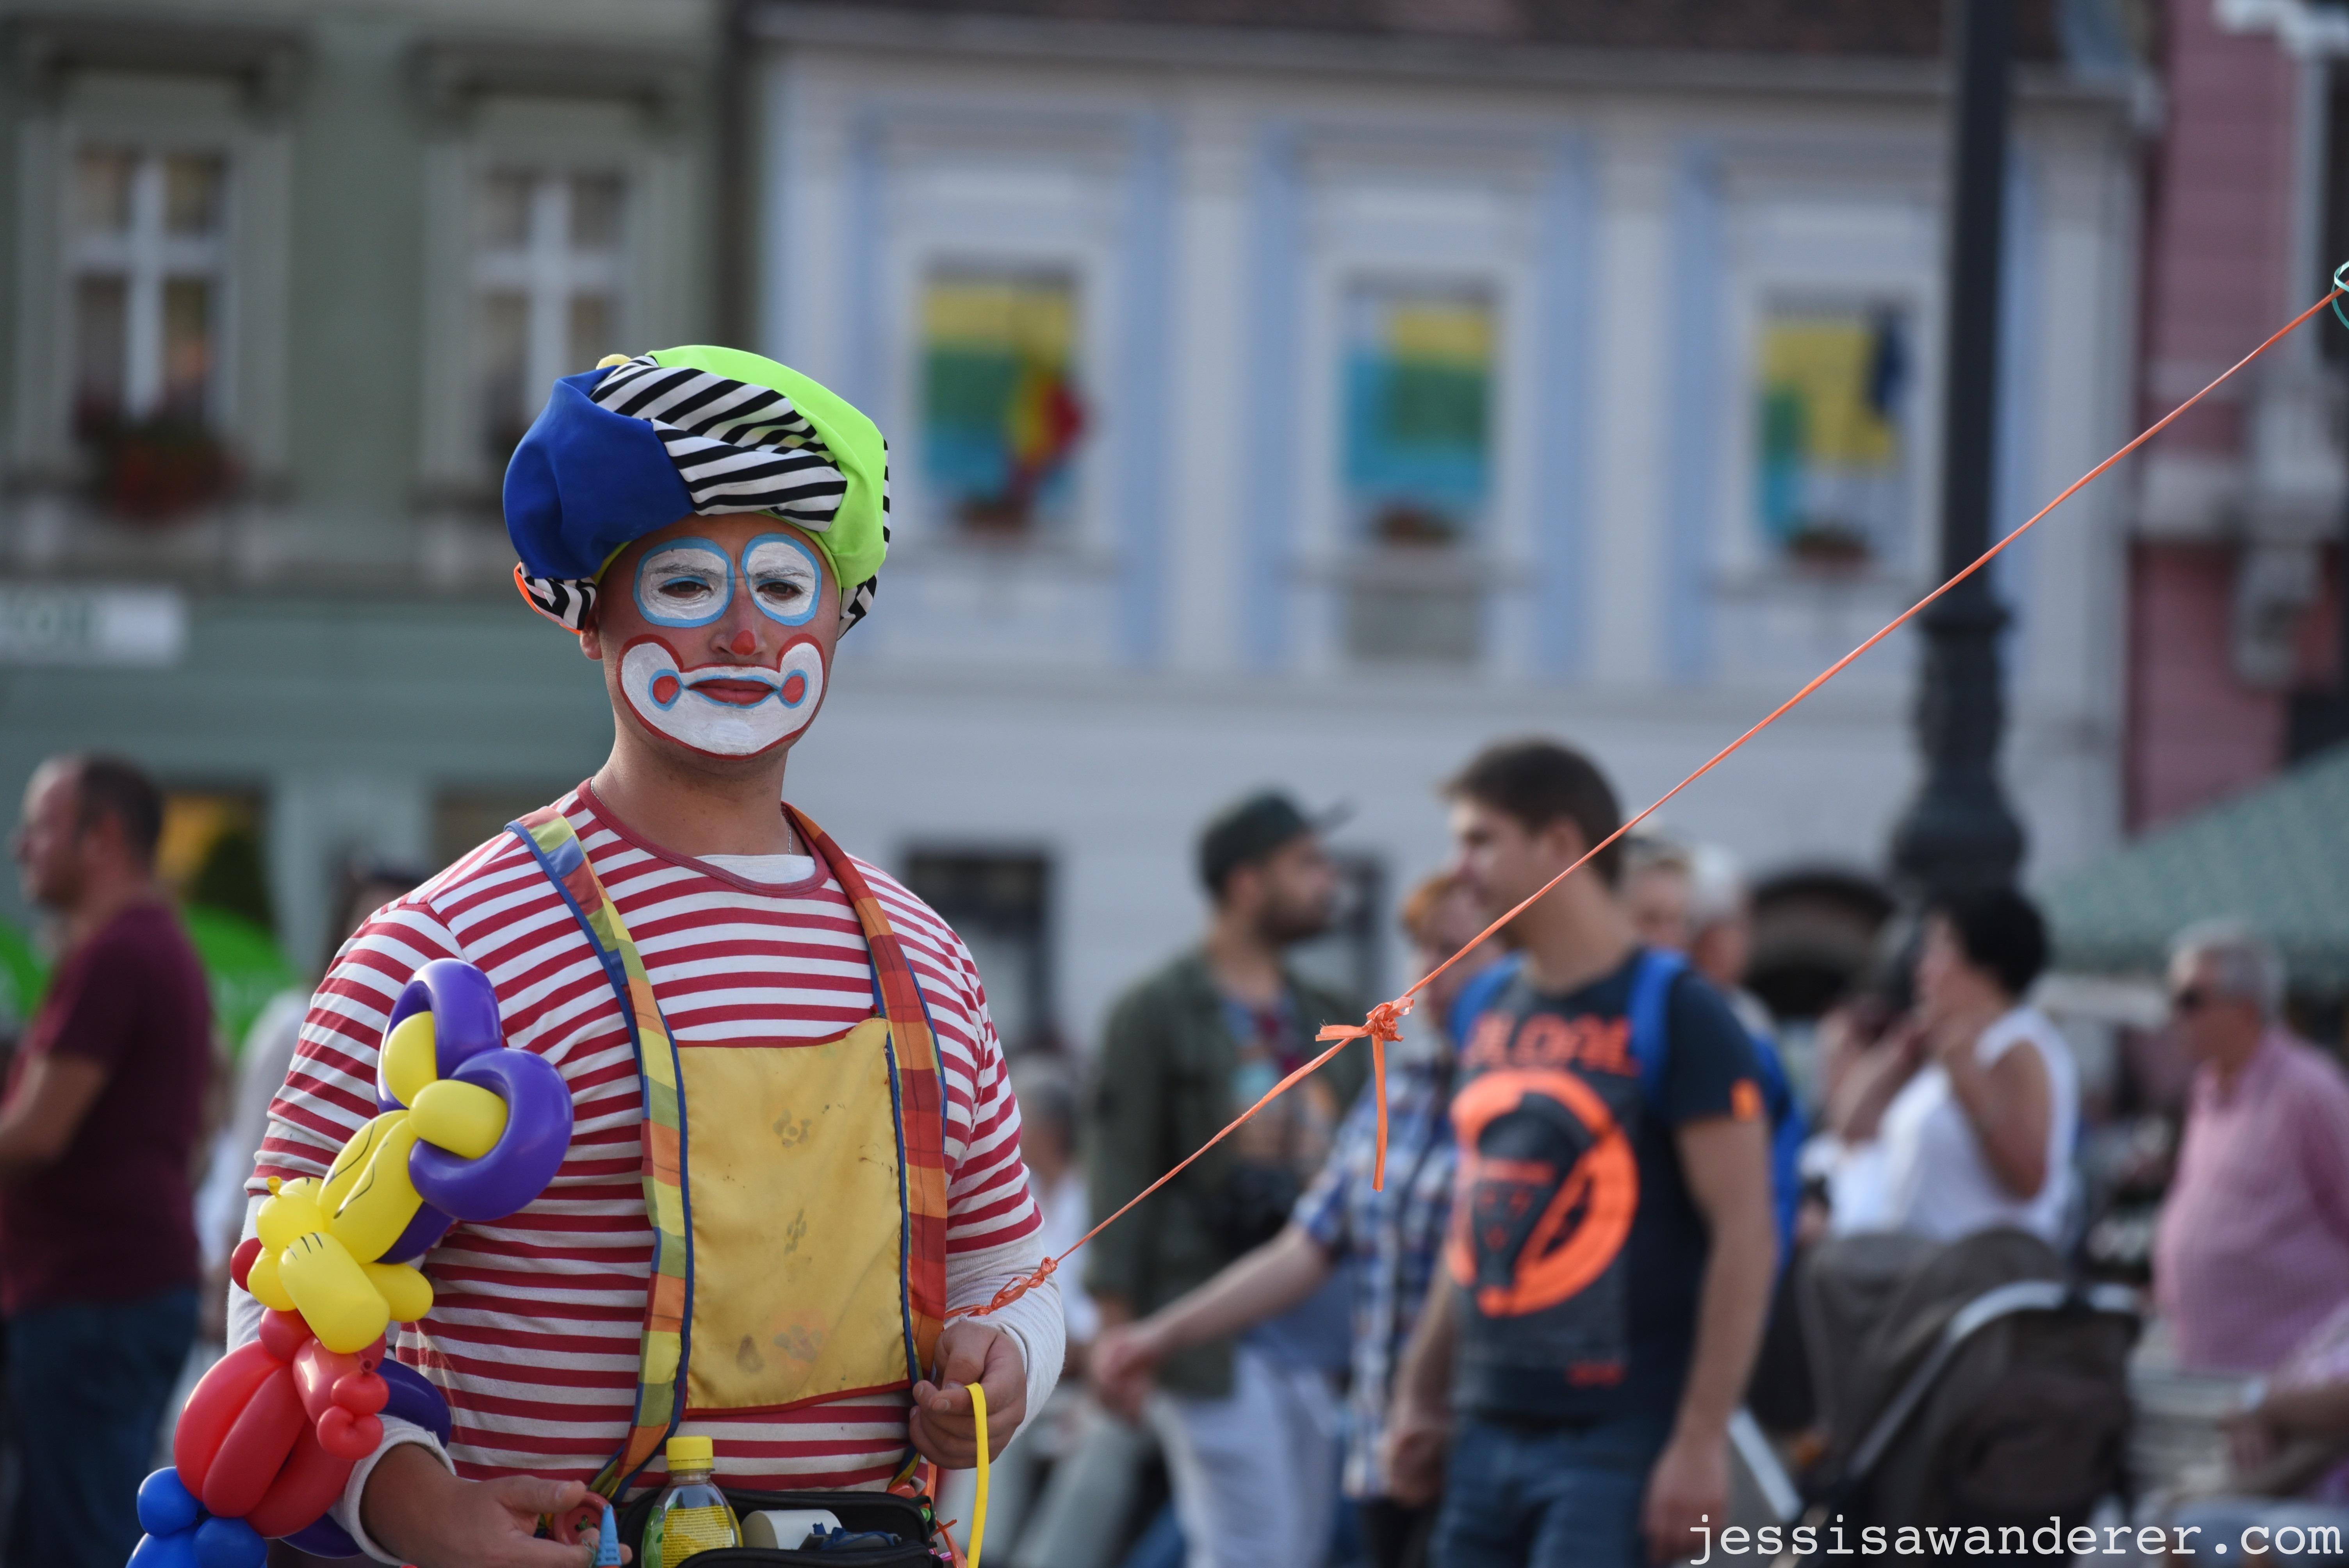 Clown Street Performer